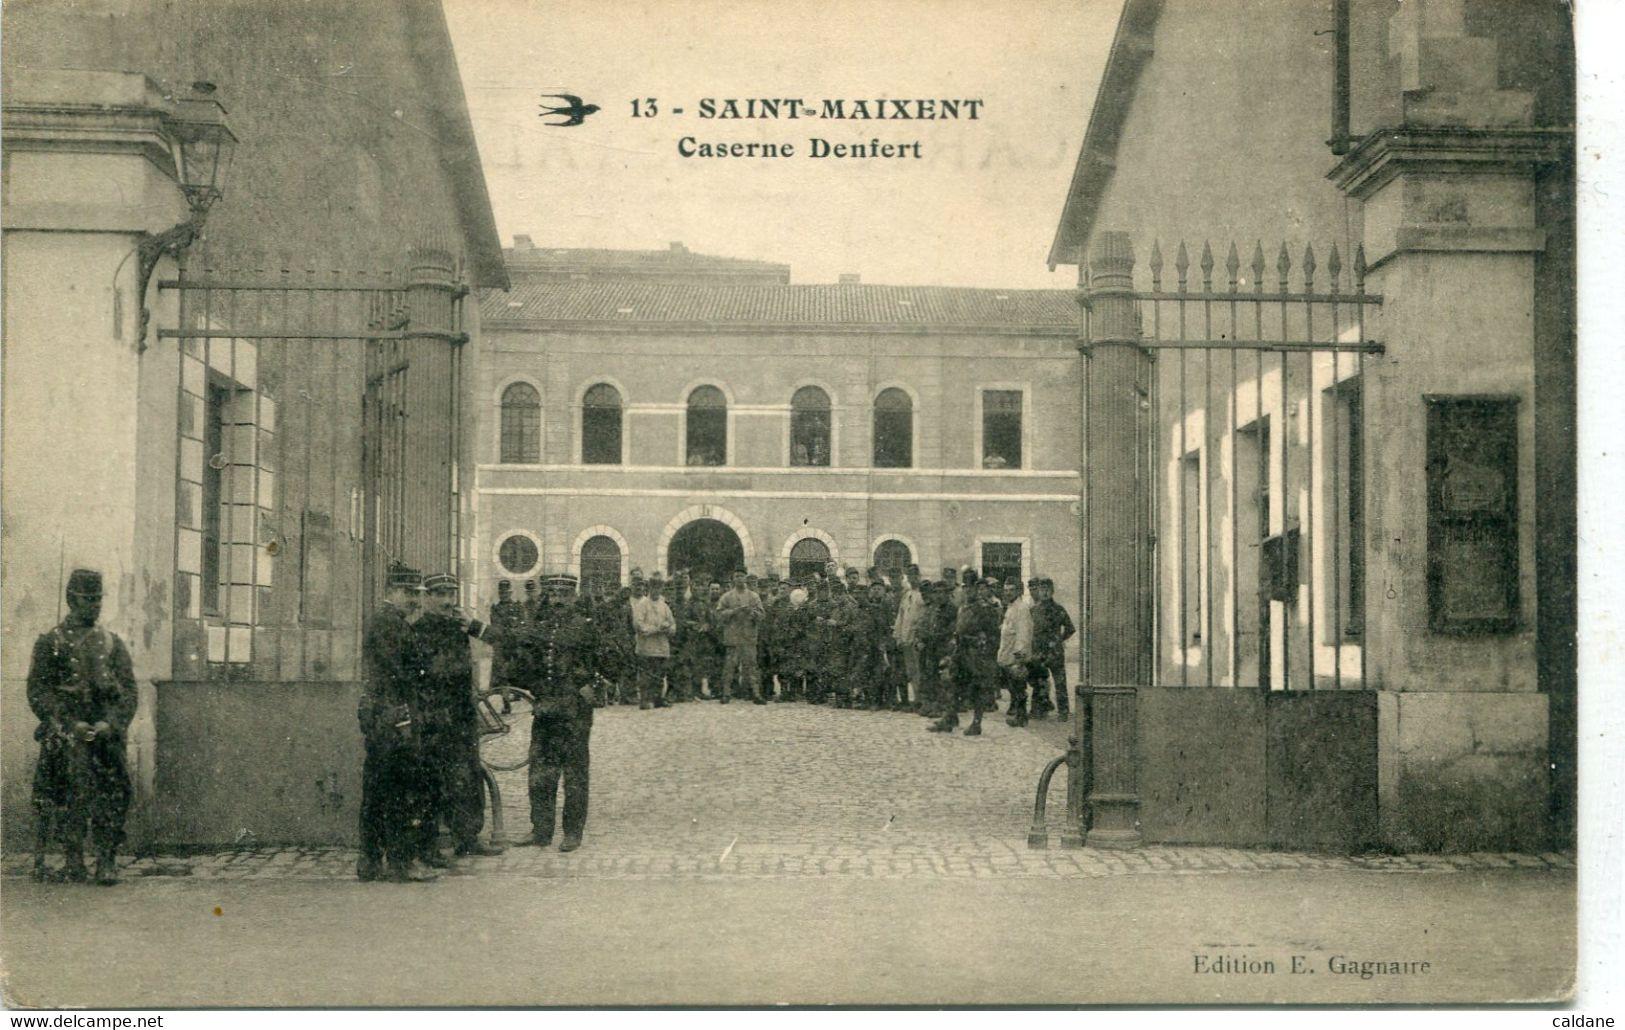 - 79- DEUX-SEVRES -  SAINT-MAIXENT - Caserne Denfert - Barracks